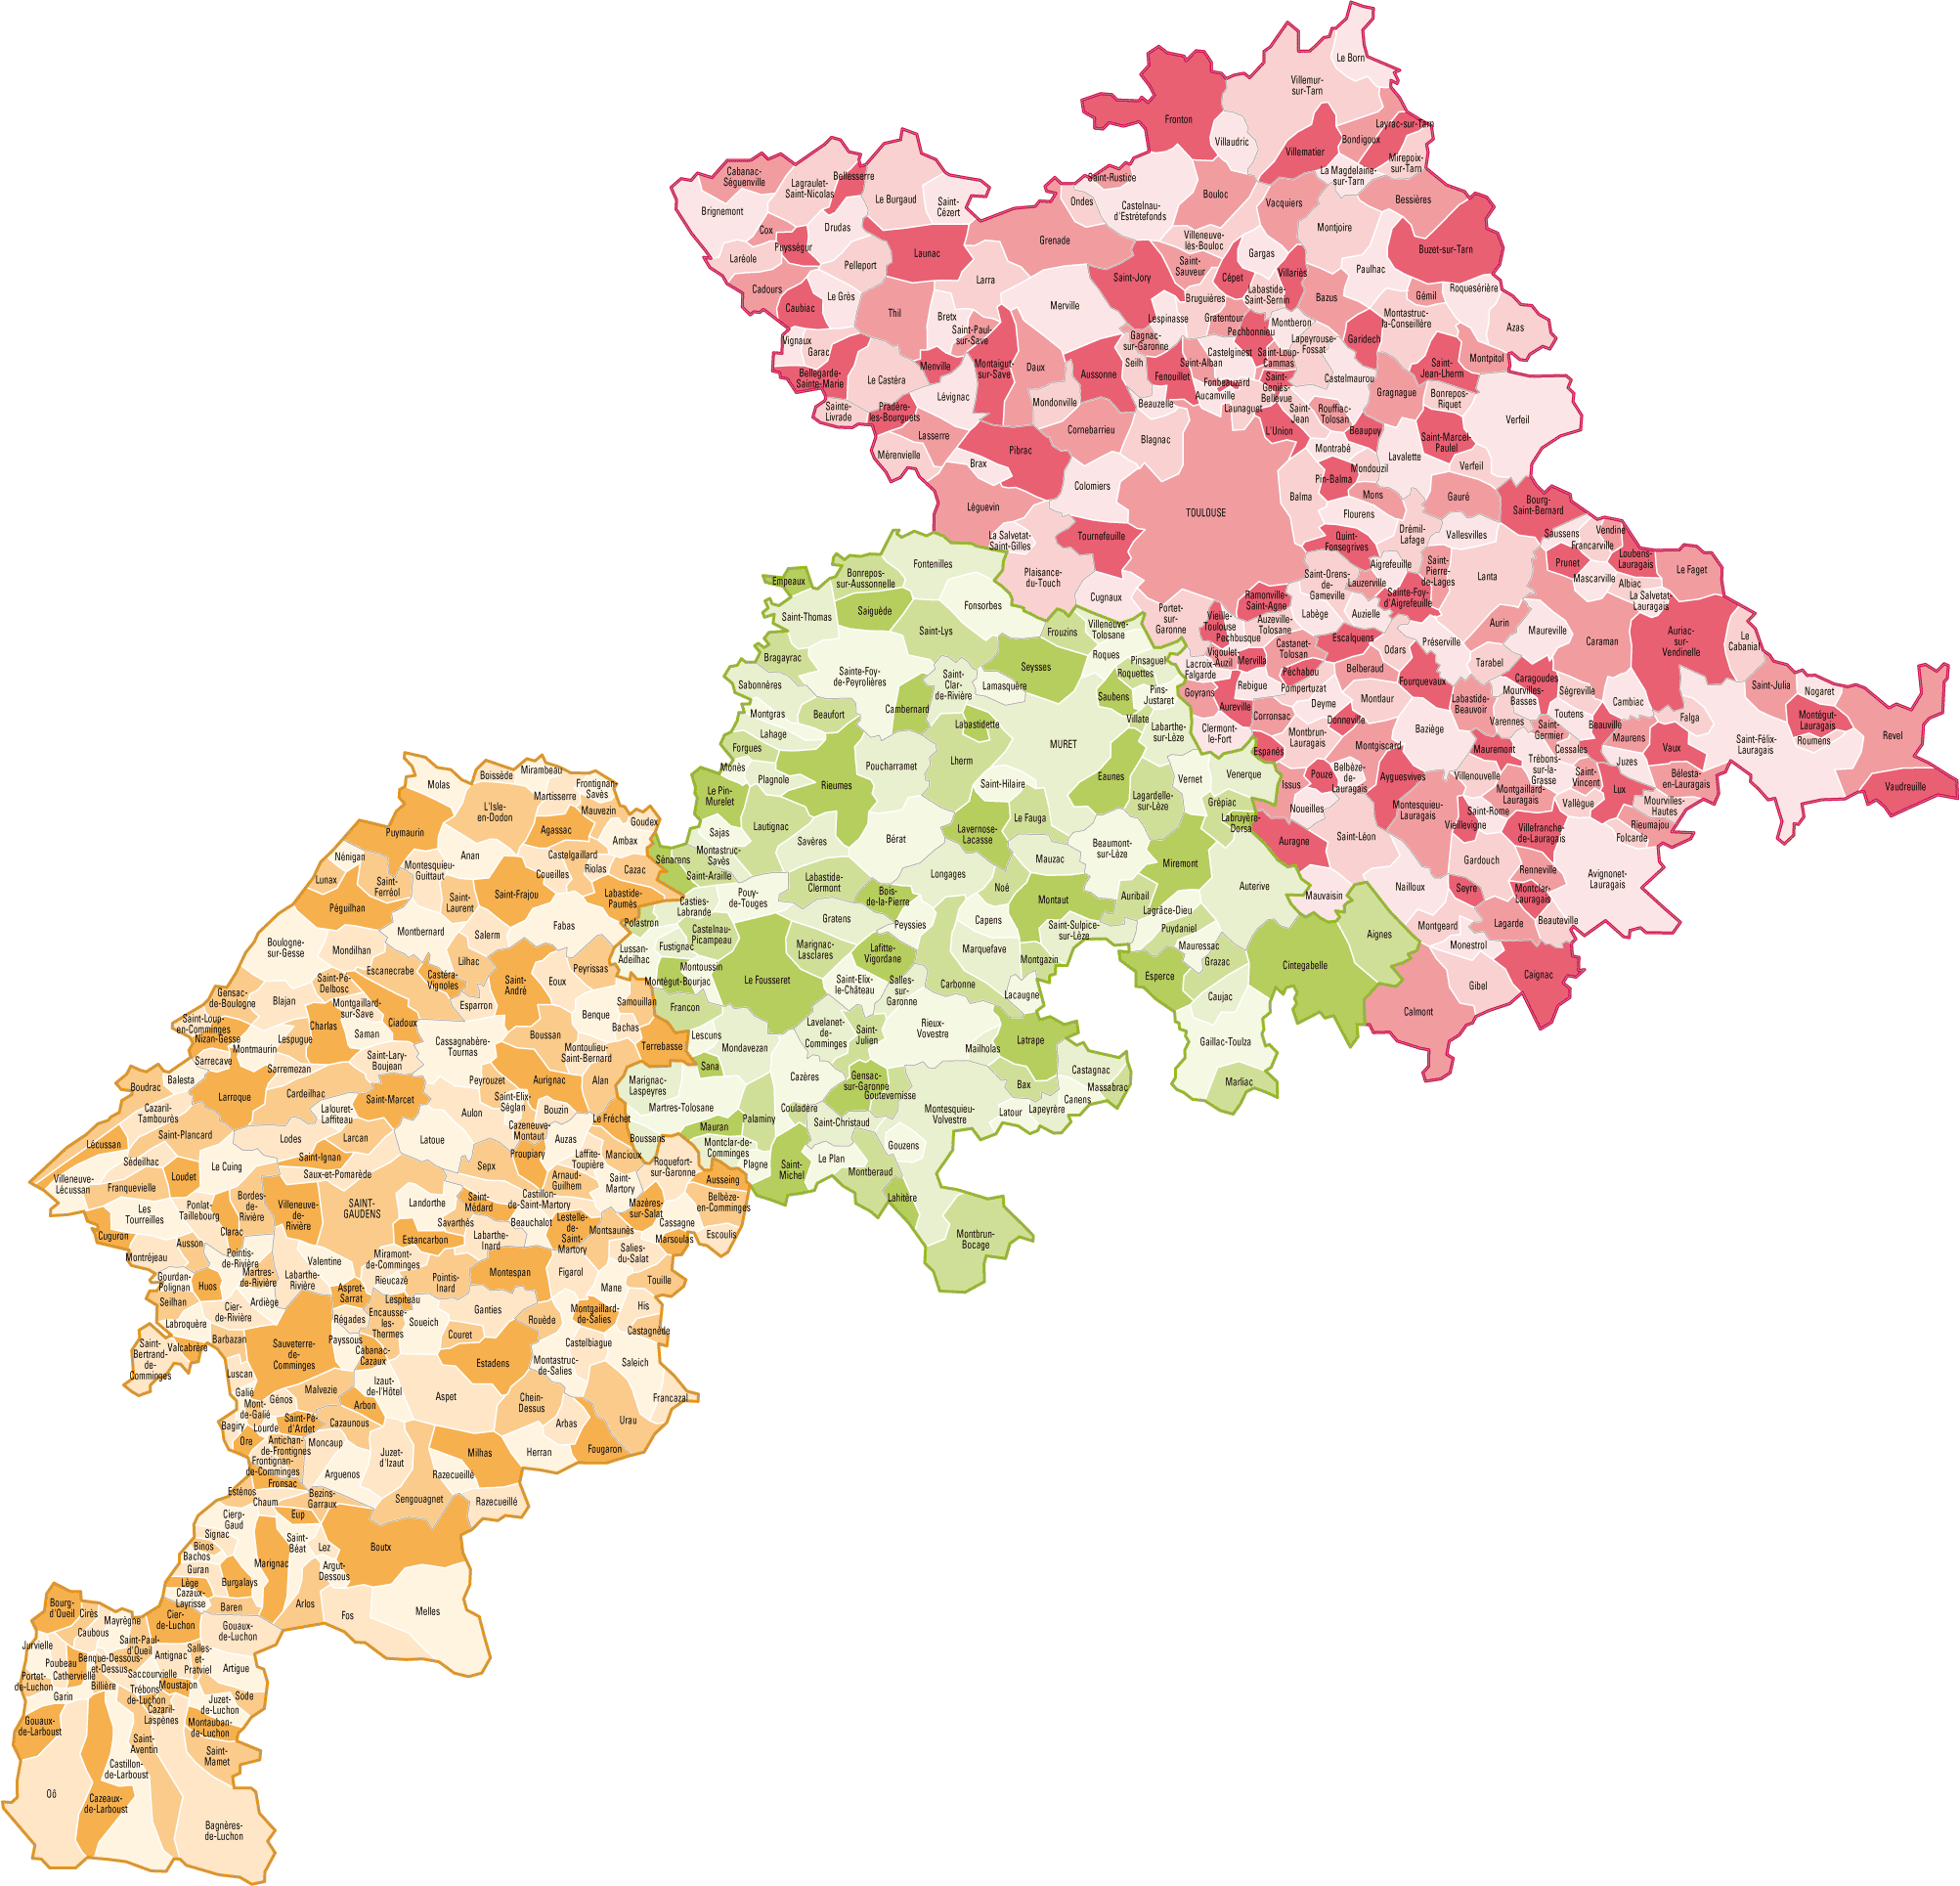 Liste Habitants Villes France